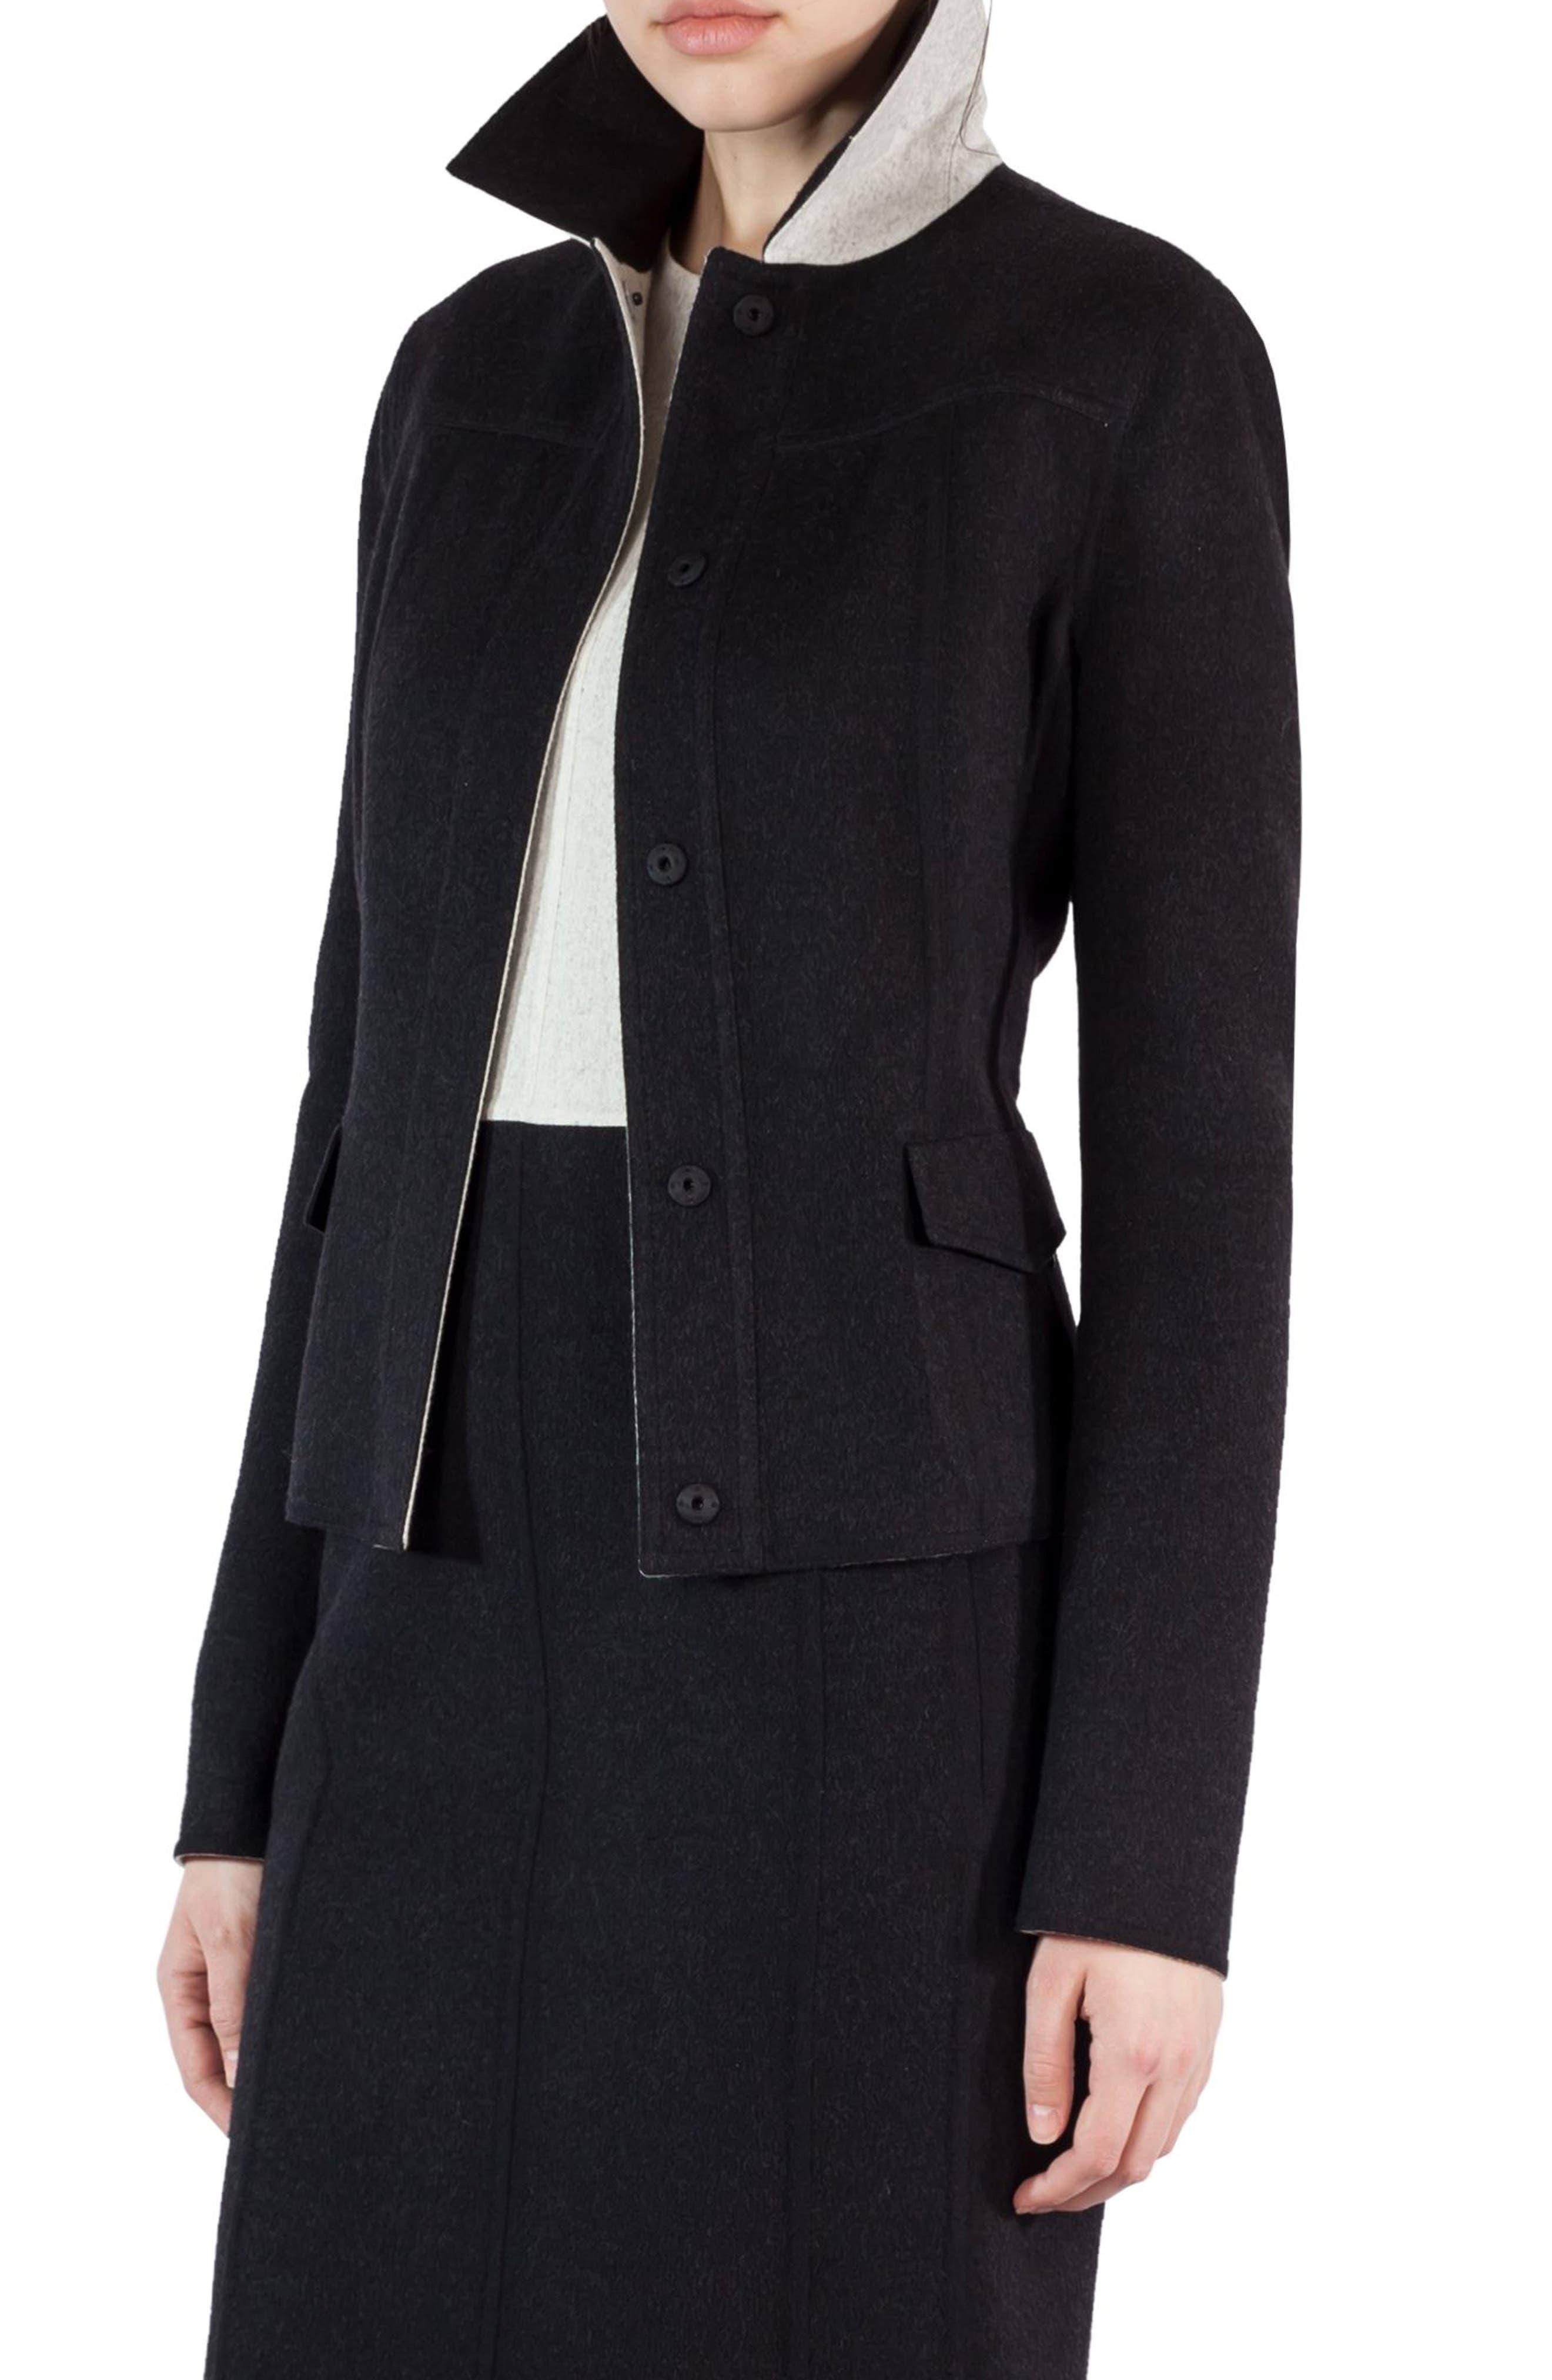 Main Image - Akris Double Face Wool Reversible Bicolor Jacket